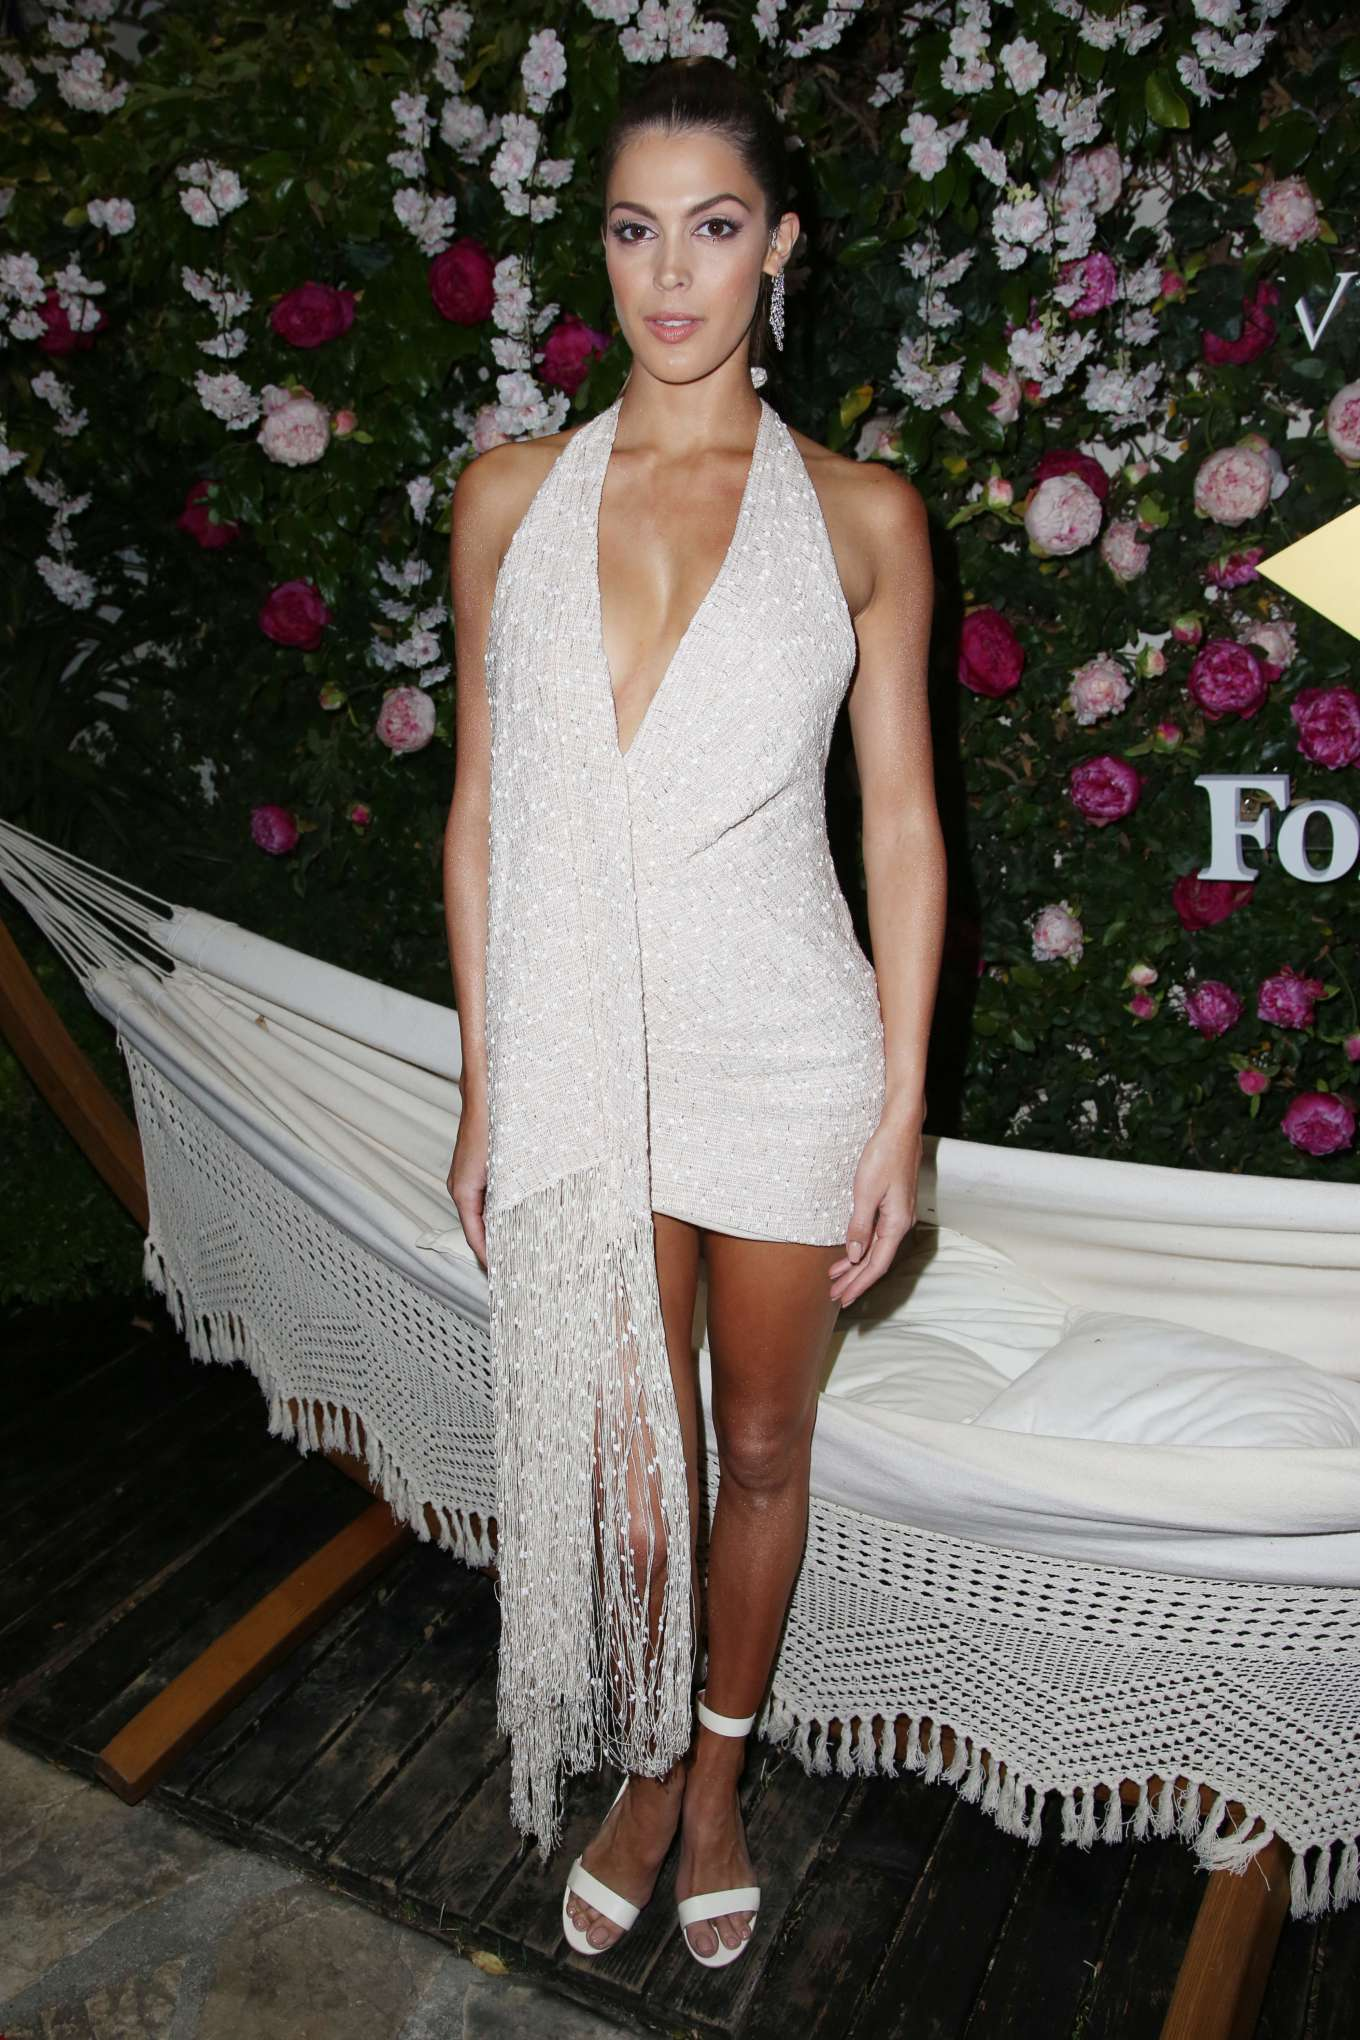 Iris Mittenaere 2019 : Iris Mittenaere at Villa AH in Cannes-11